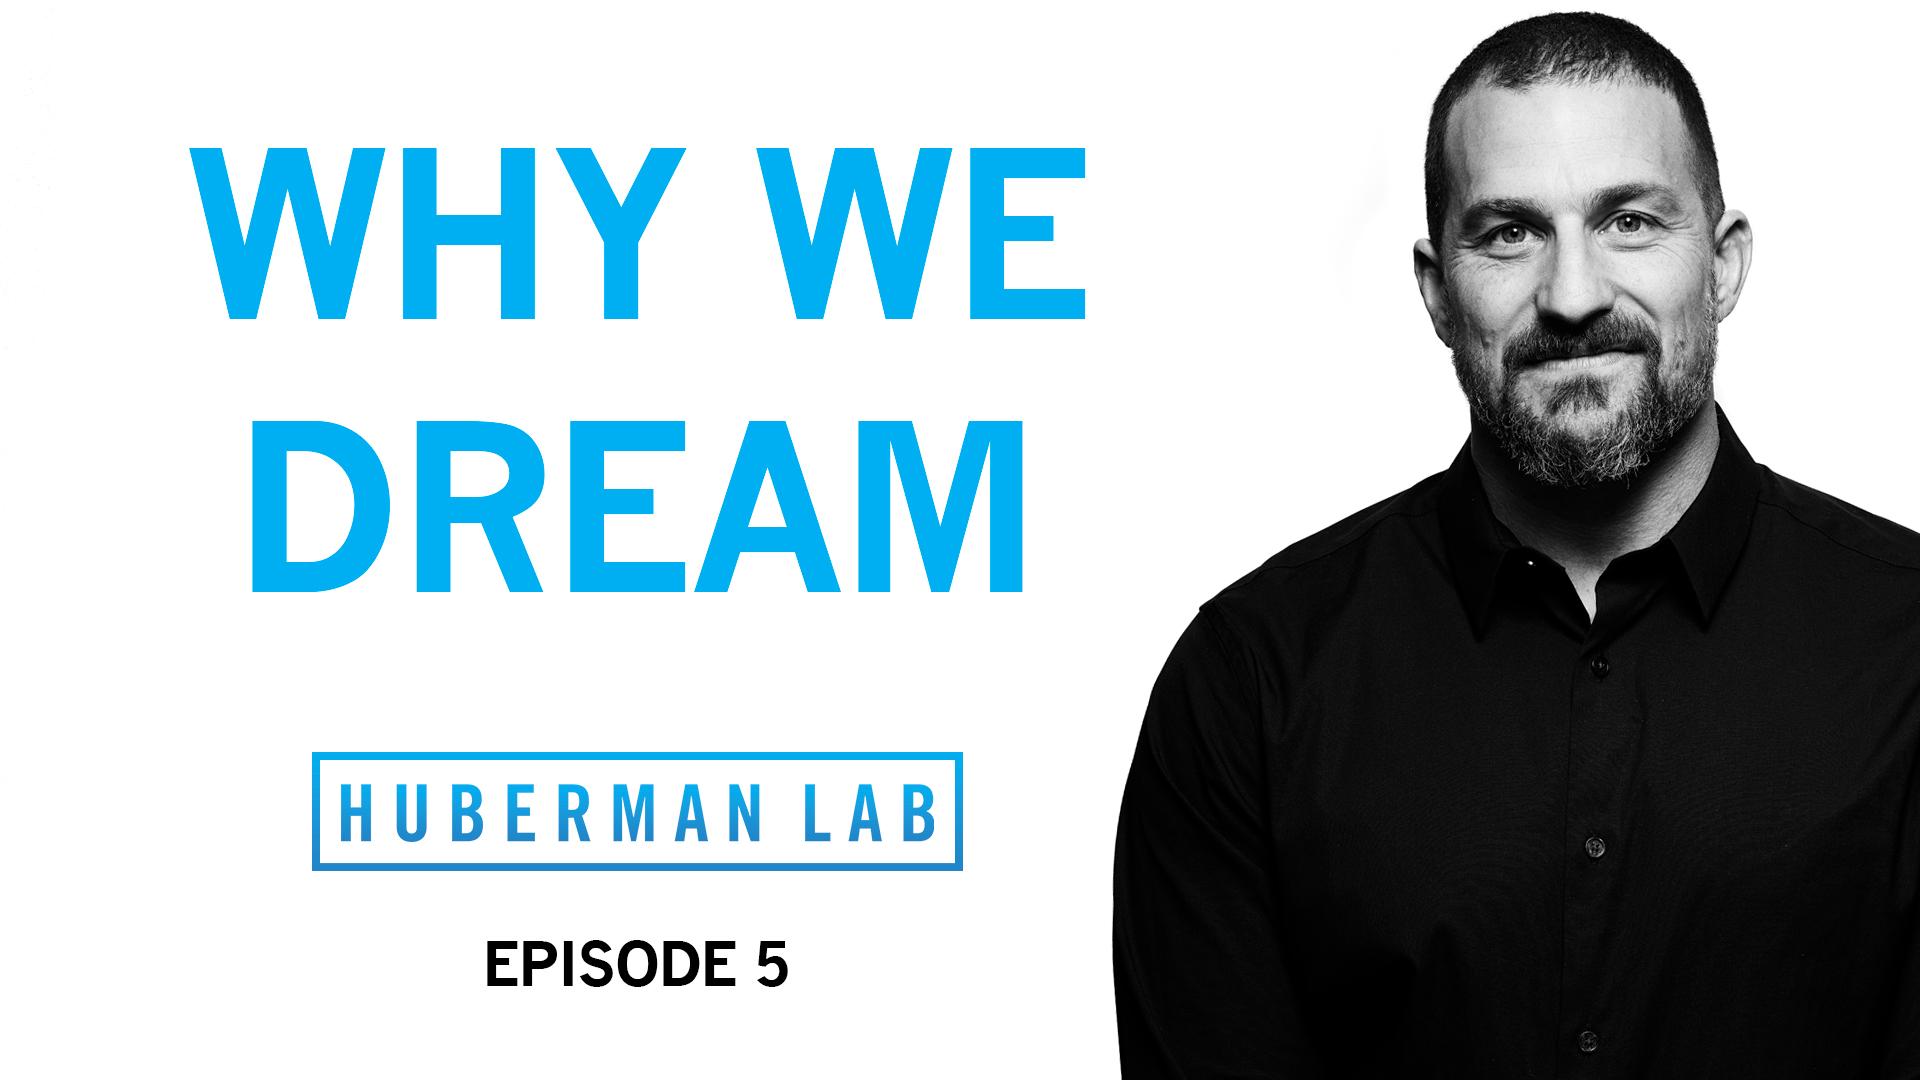 Huberman Lab Podcast Episode 5 Title Card